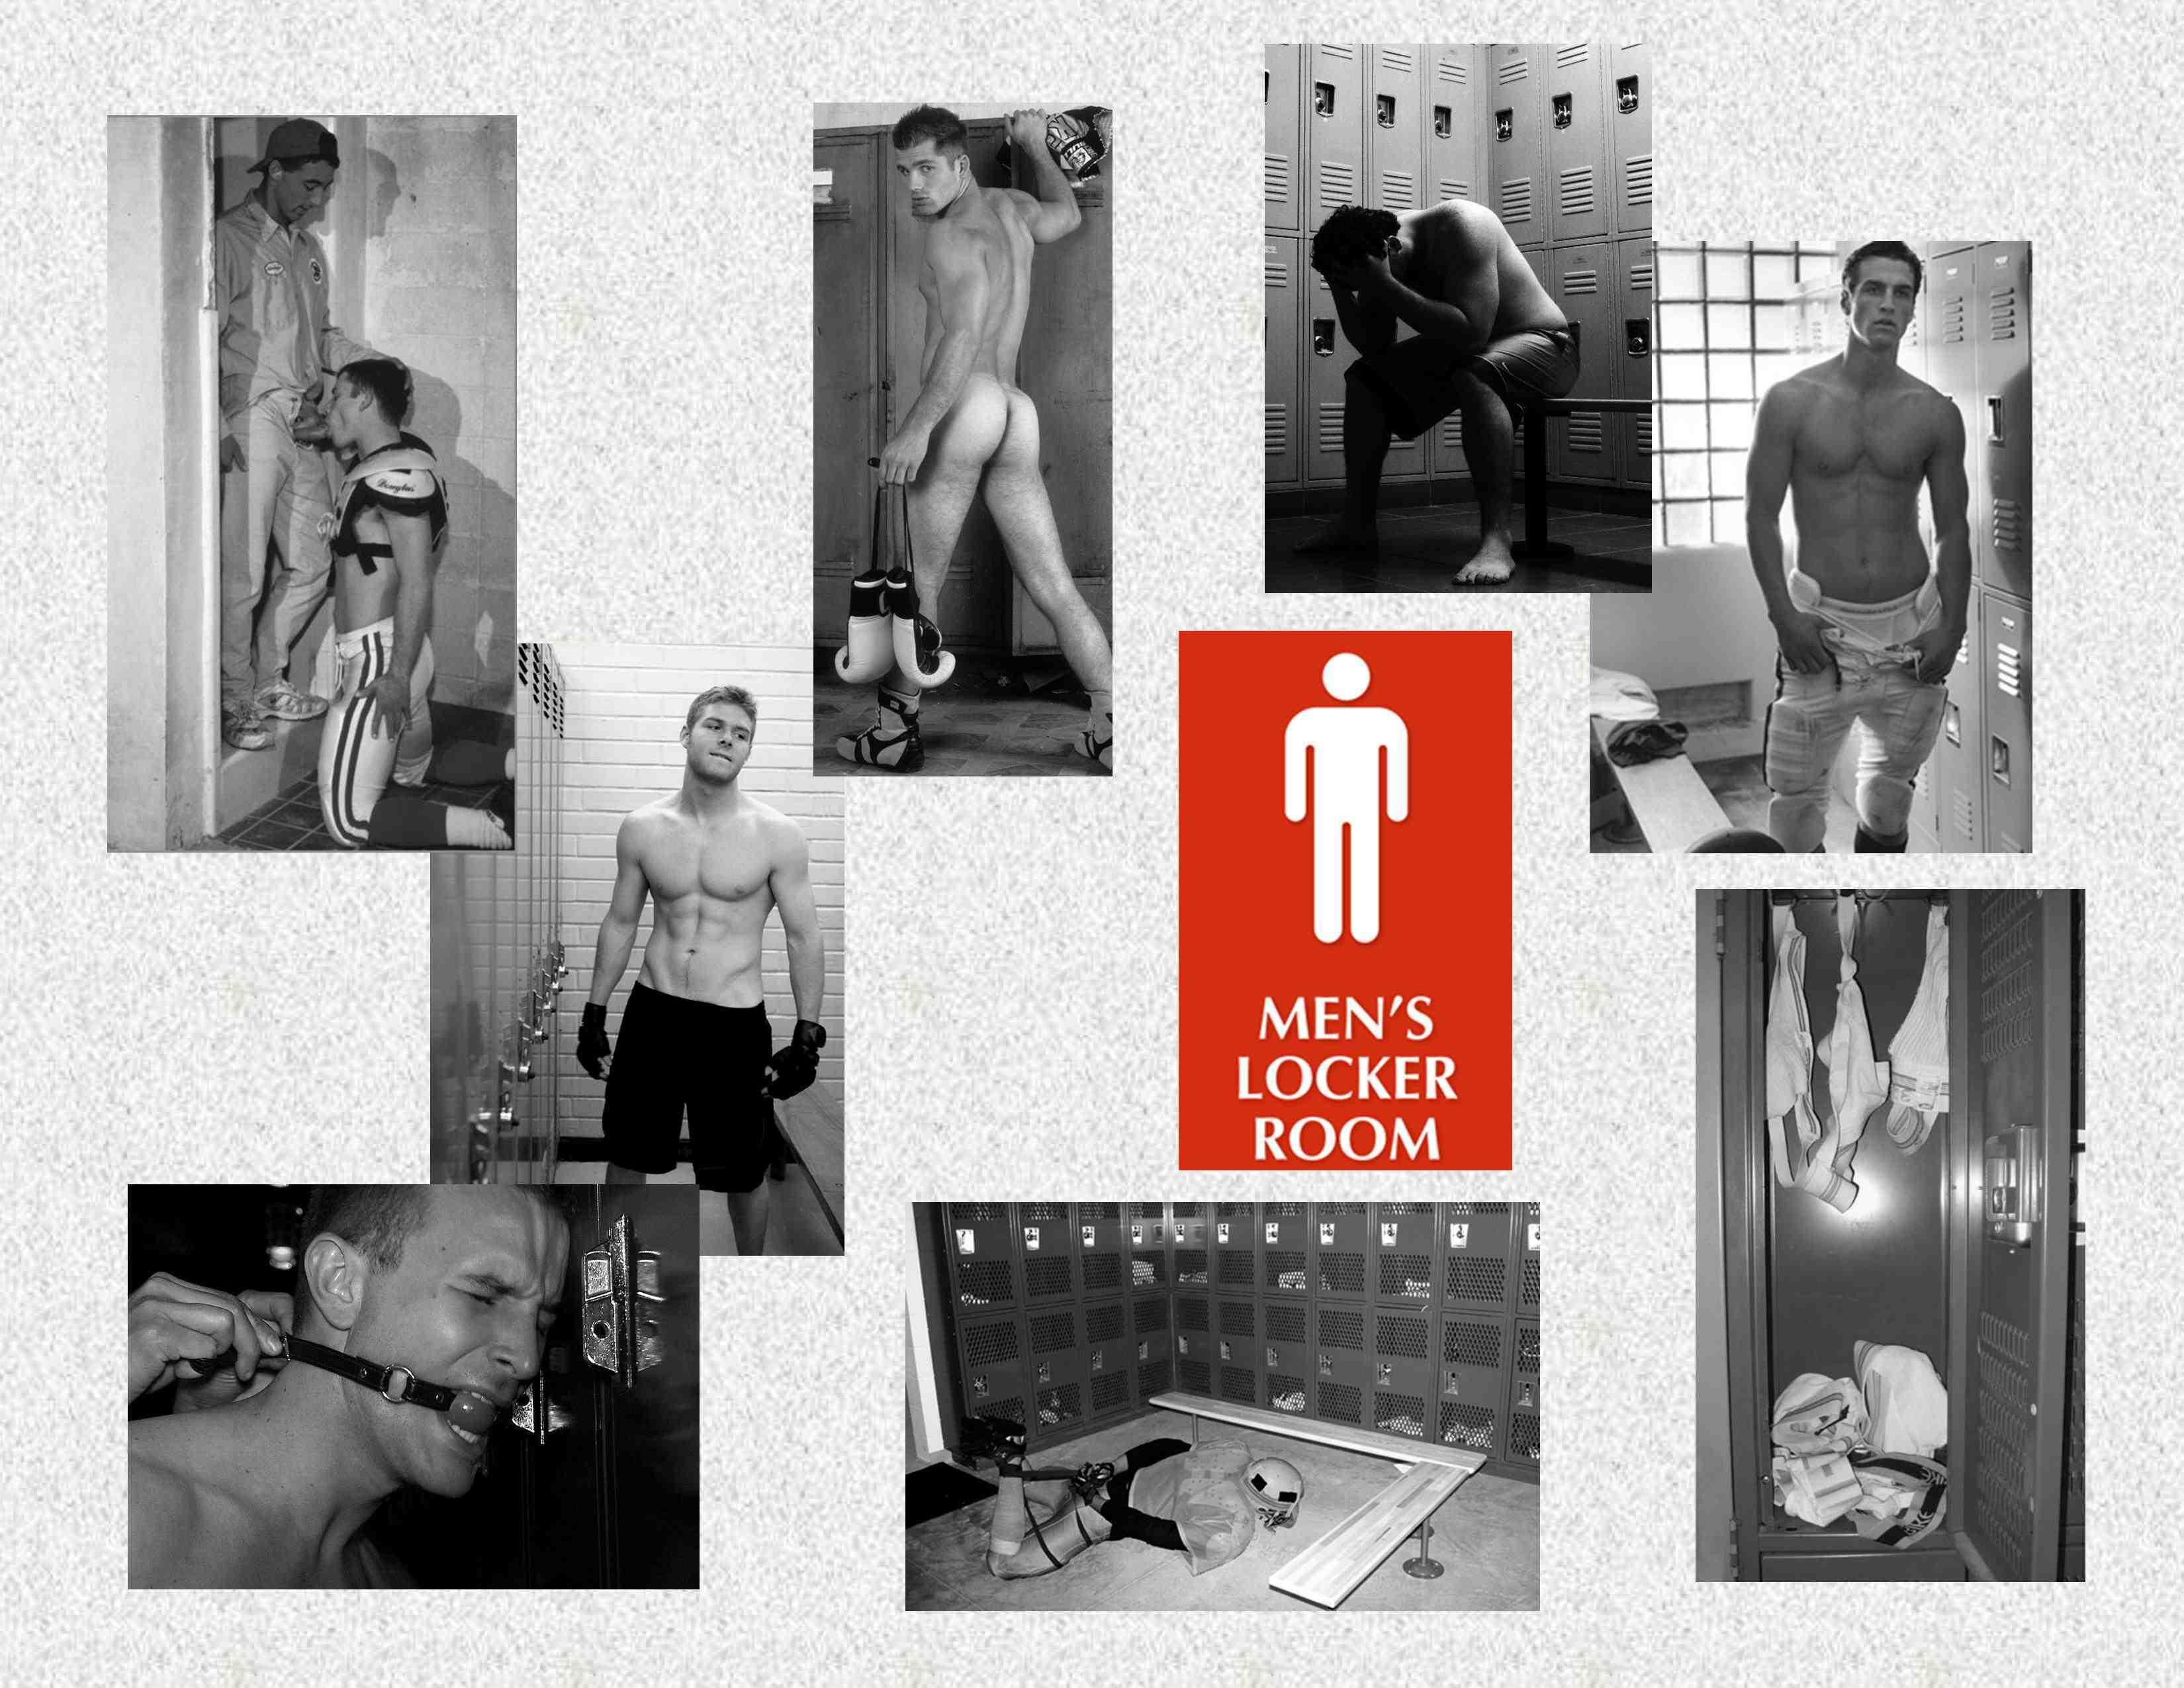 Marknorth Locker Room Tales gay bondage story